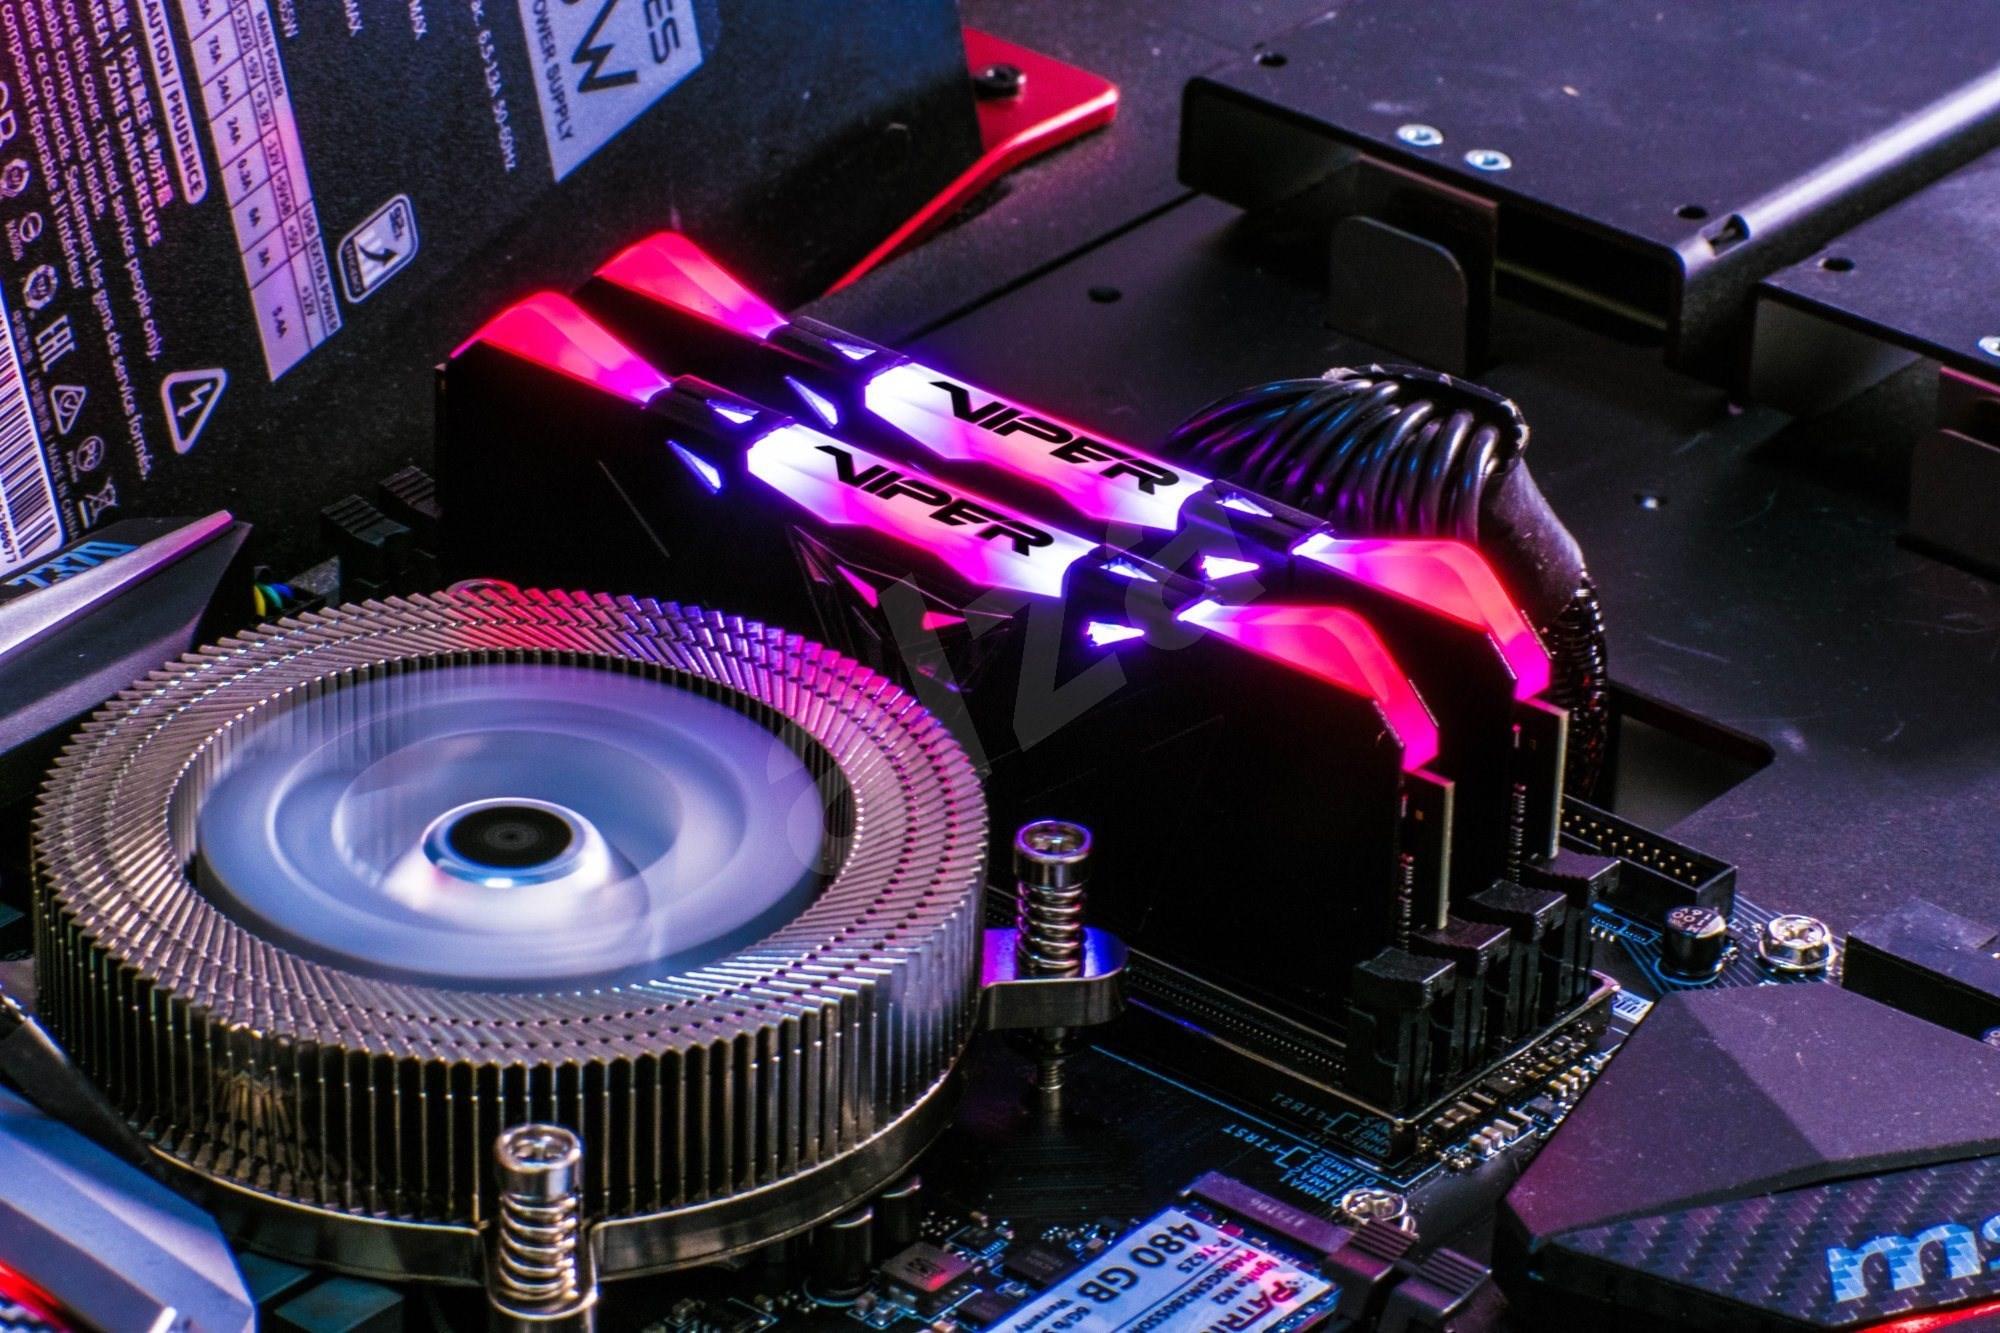 Patriot Viper RGB Series 16GB KIT DDR4 3200Mhz CL16 DDR4 fekete - Rendszermemória